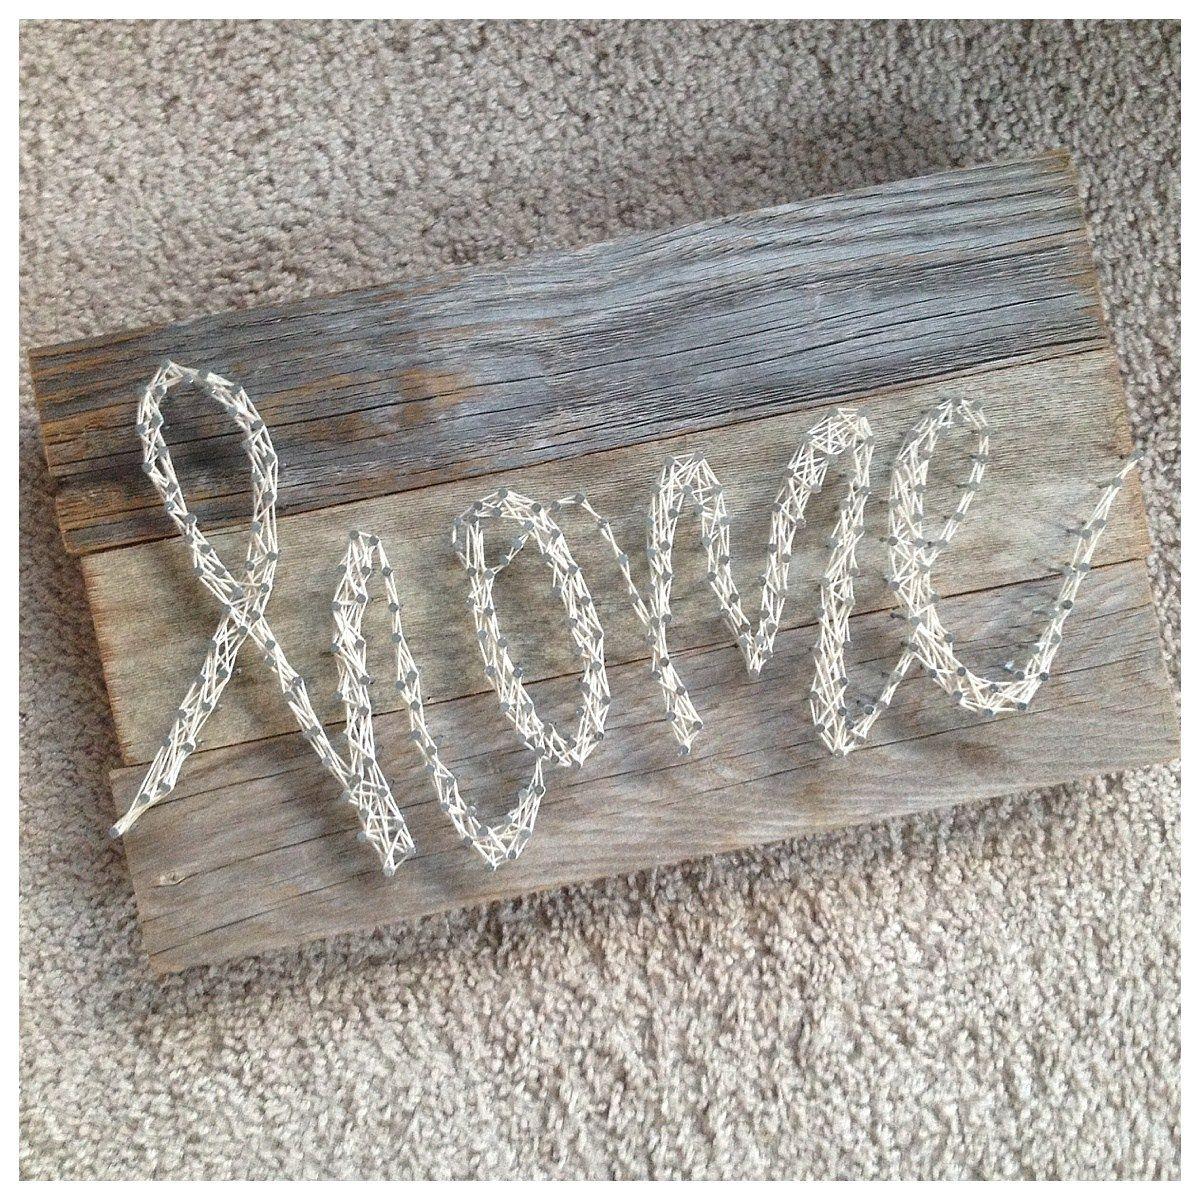 String art tutorial diy home decor pallet sign cute crafts string art tutorial diy home decor pallet sign baditri Image collections